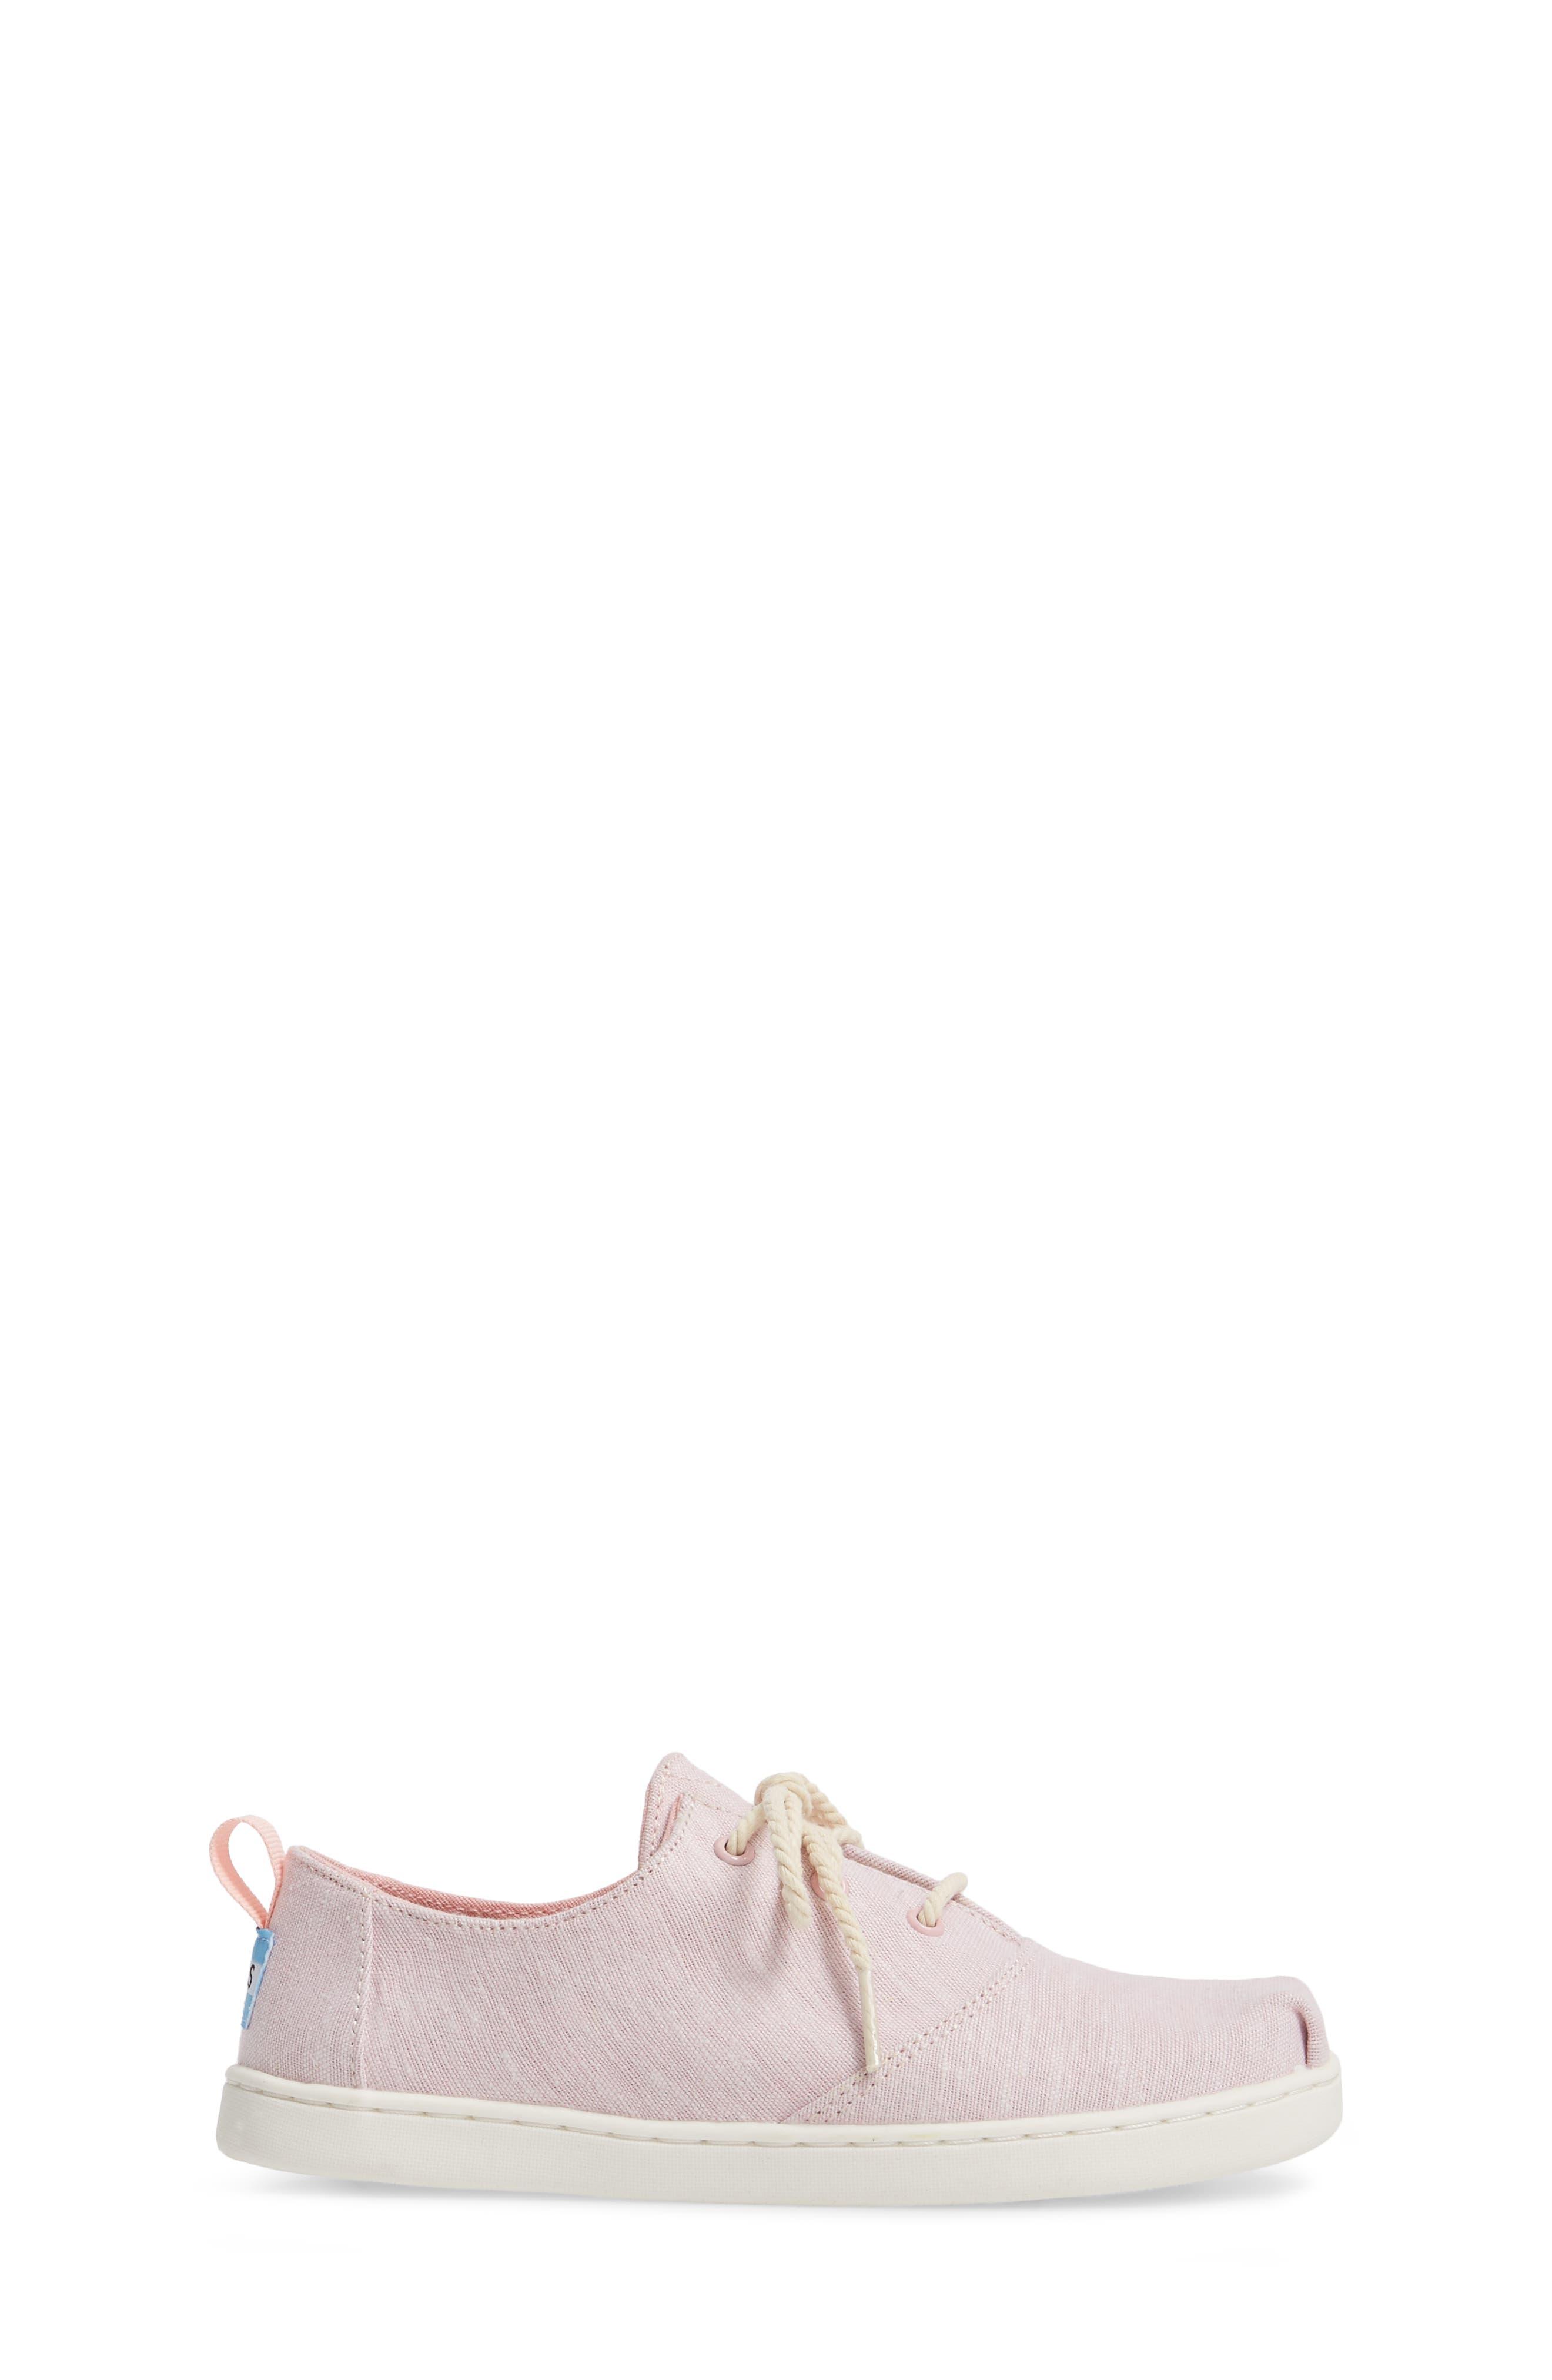 Lumin Sneaker,                             Alternate thumbnail 3, color,